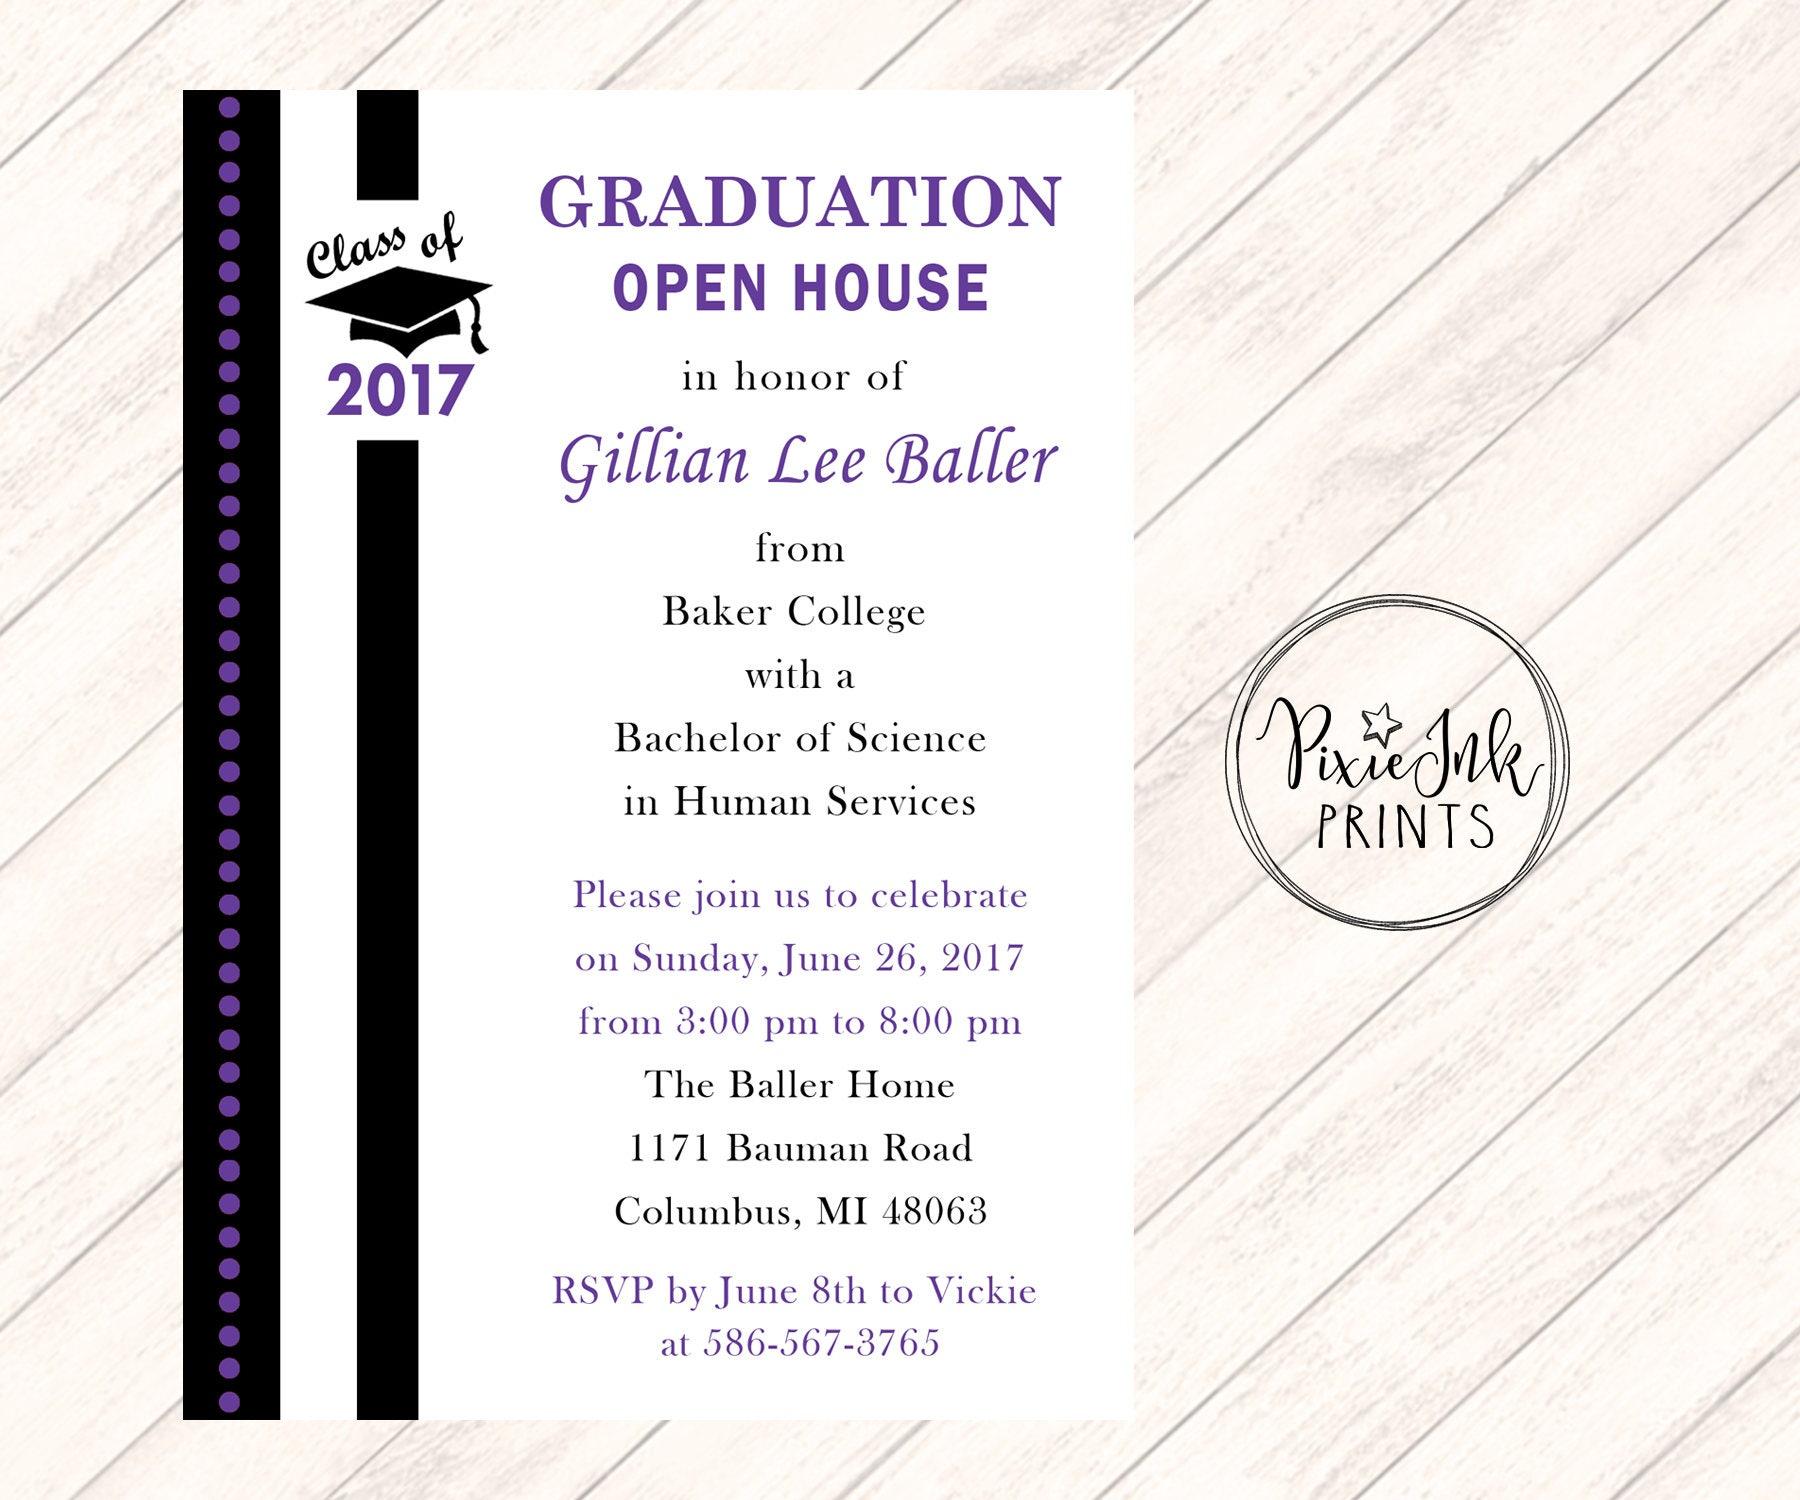 Graduation Party Invitation College Logo Graduation Invitation – Open House Party Invitation